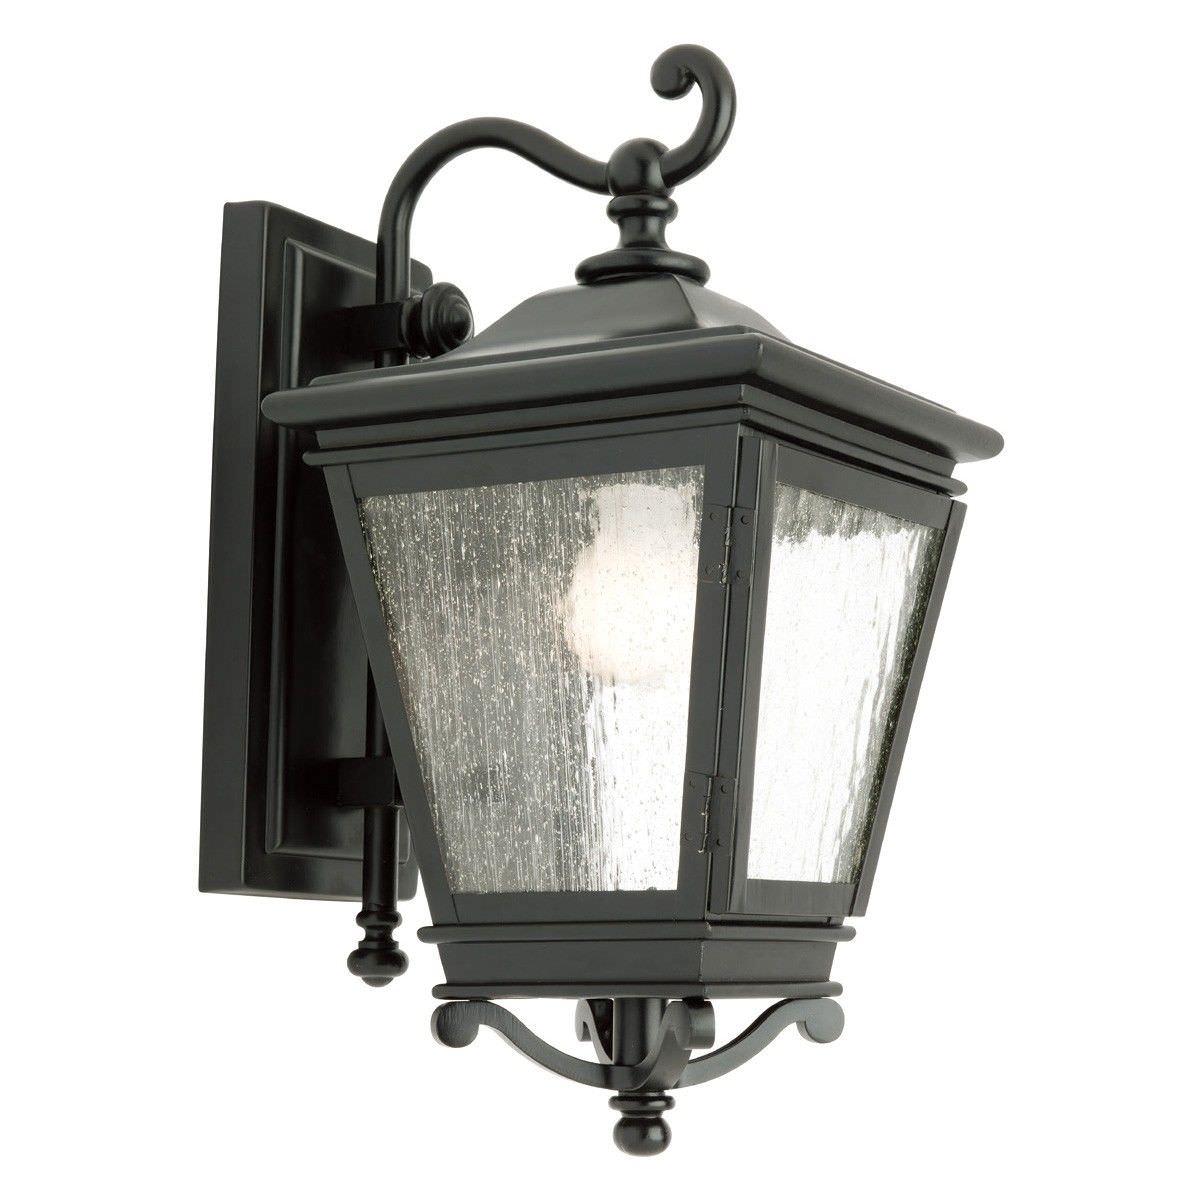 Nottingham IP43 Outdoor Wall Light - Black